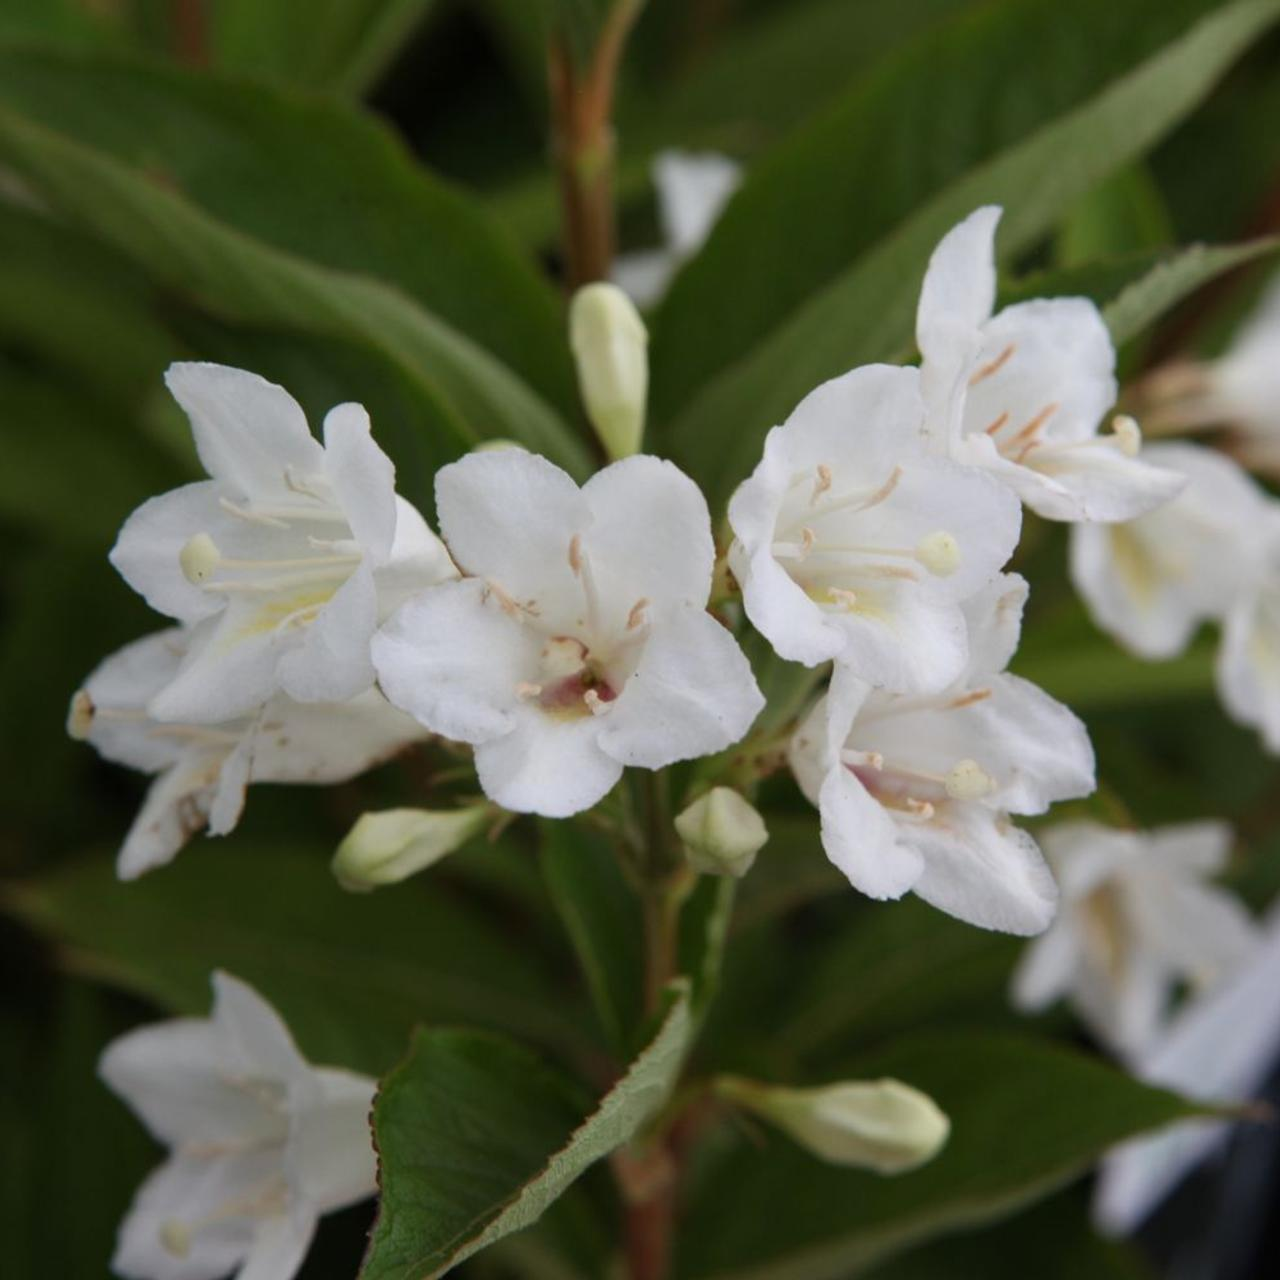 Weigela 'Candida' plant